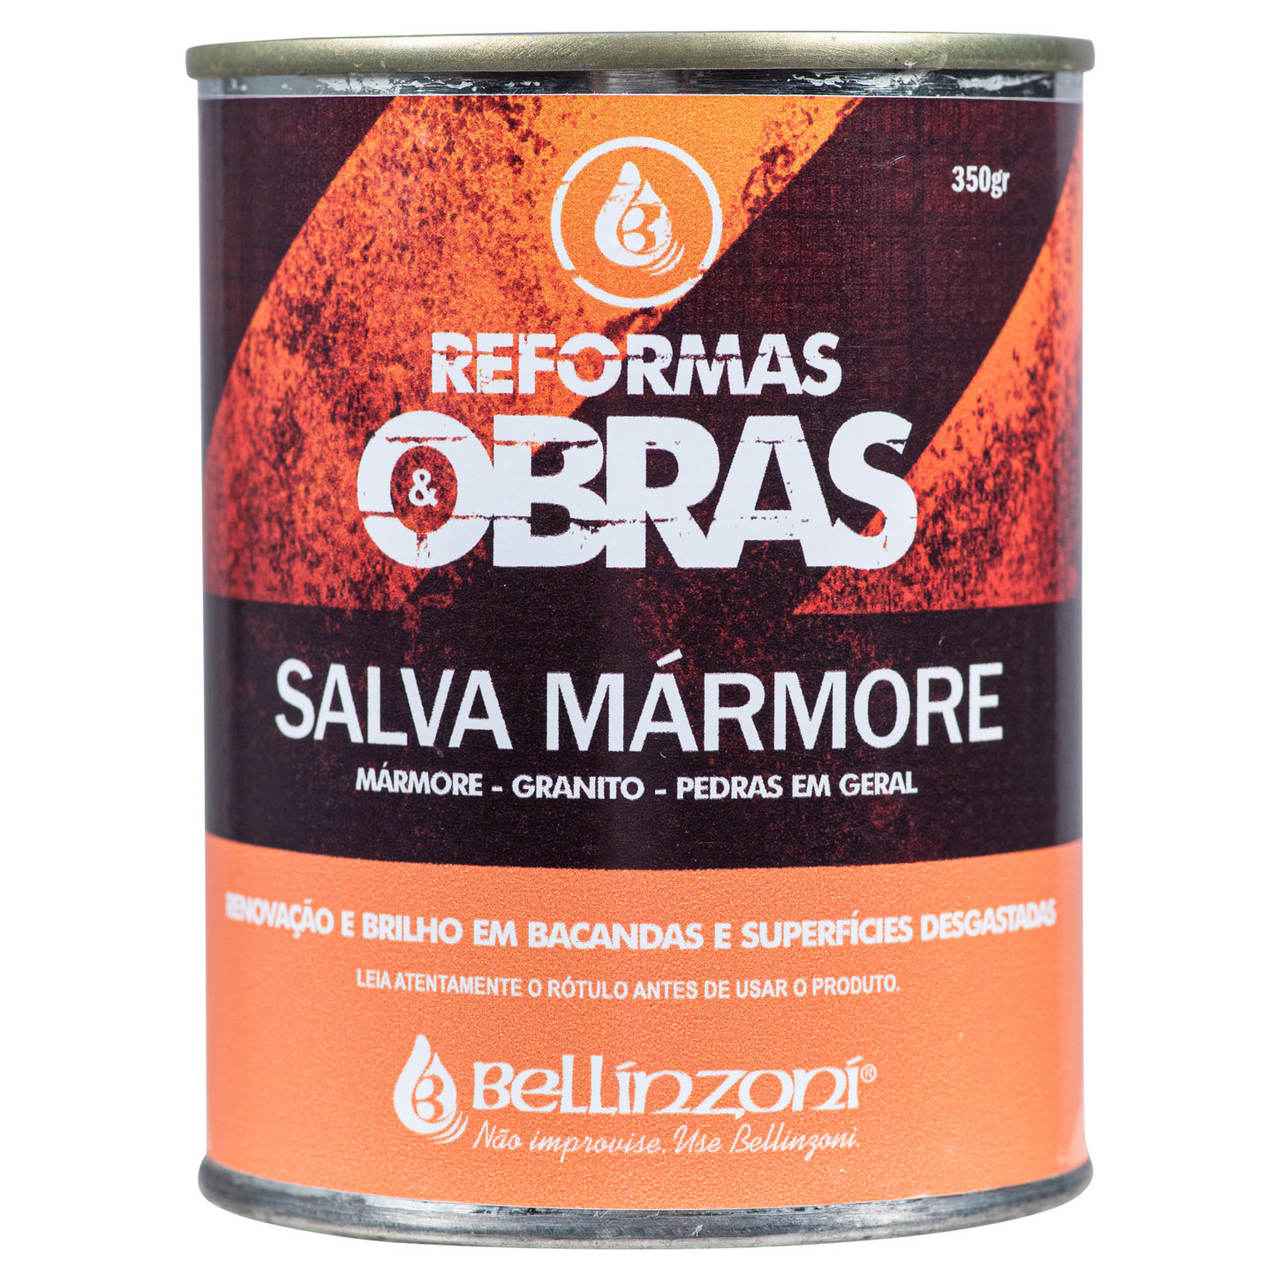 Salva Mármore Reformas e Obras Bellinzoni 350g